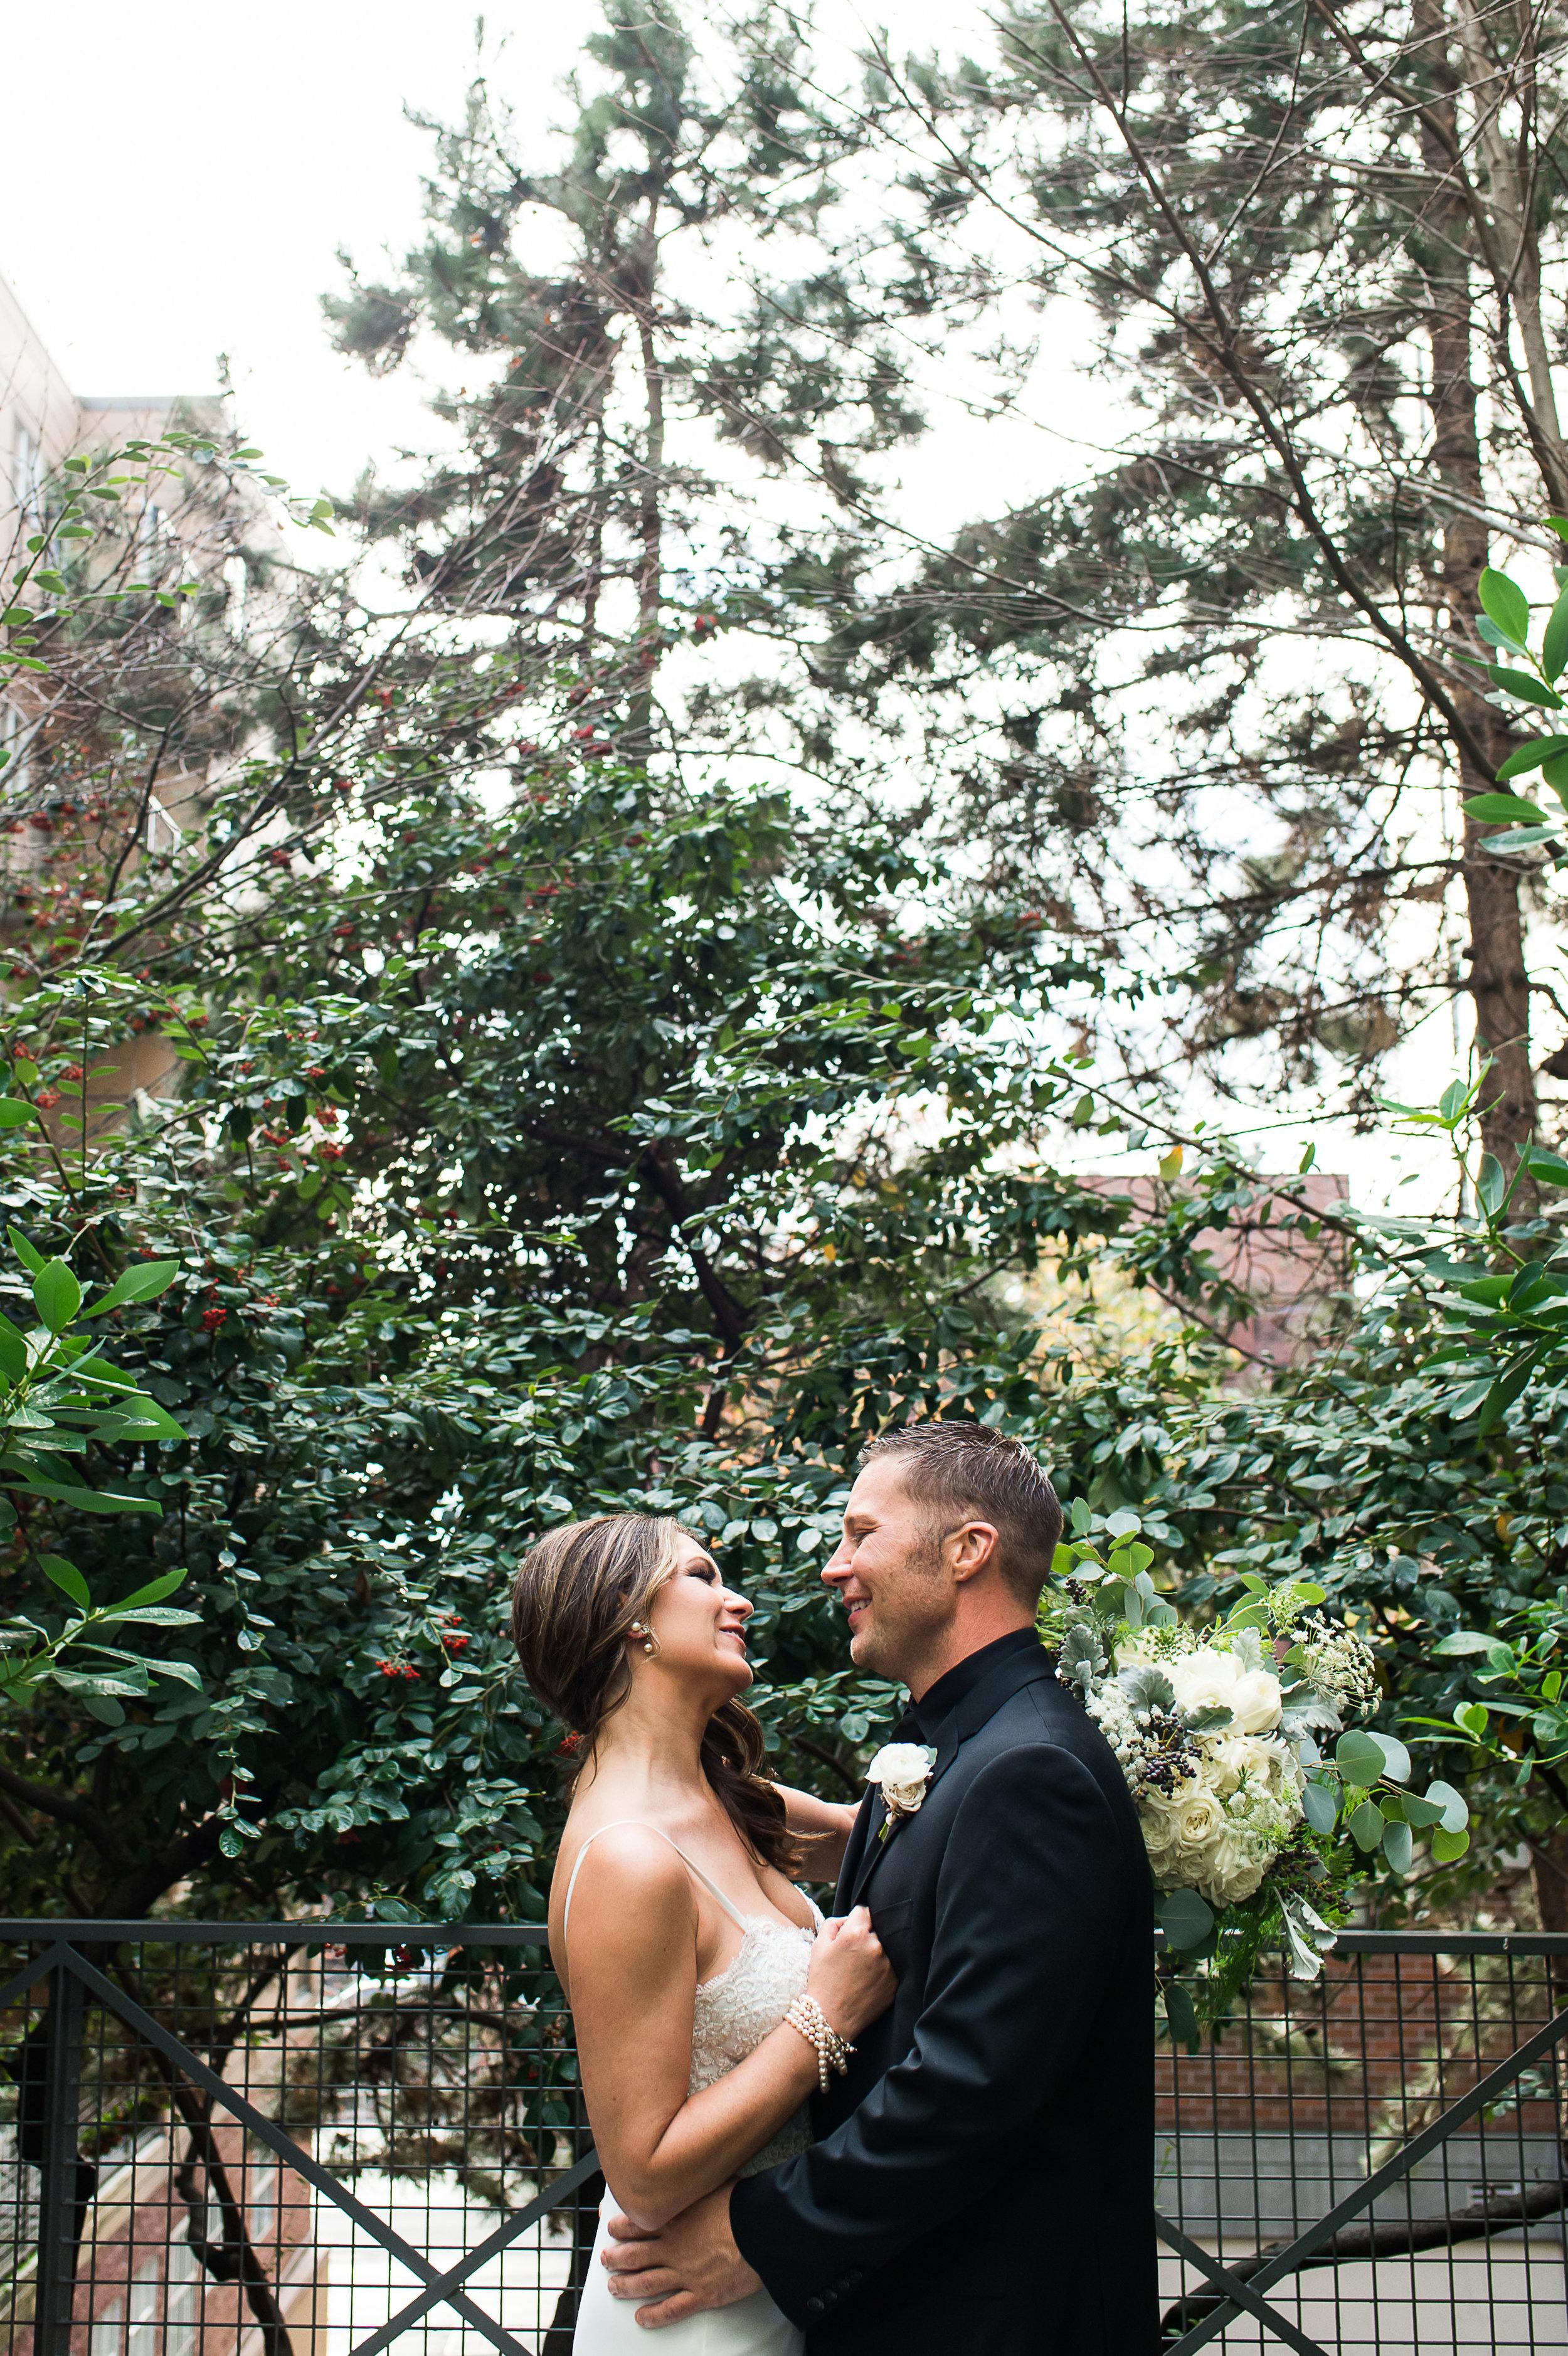 JJ-wedding-Van-Wyhe-Photography-186.jpg